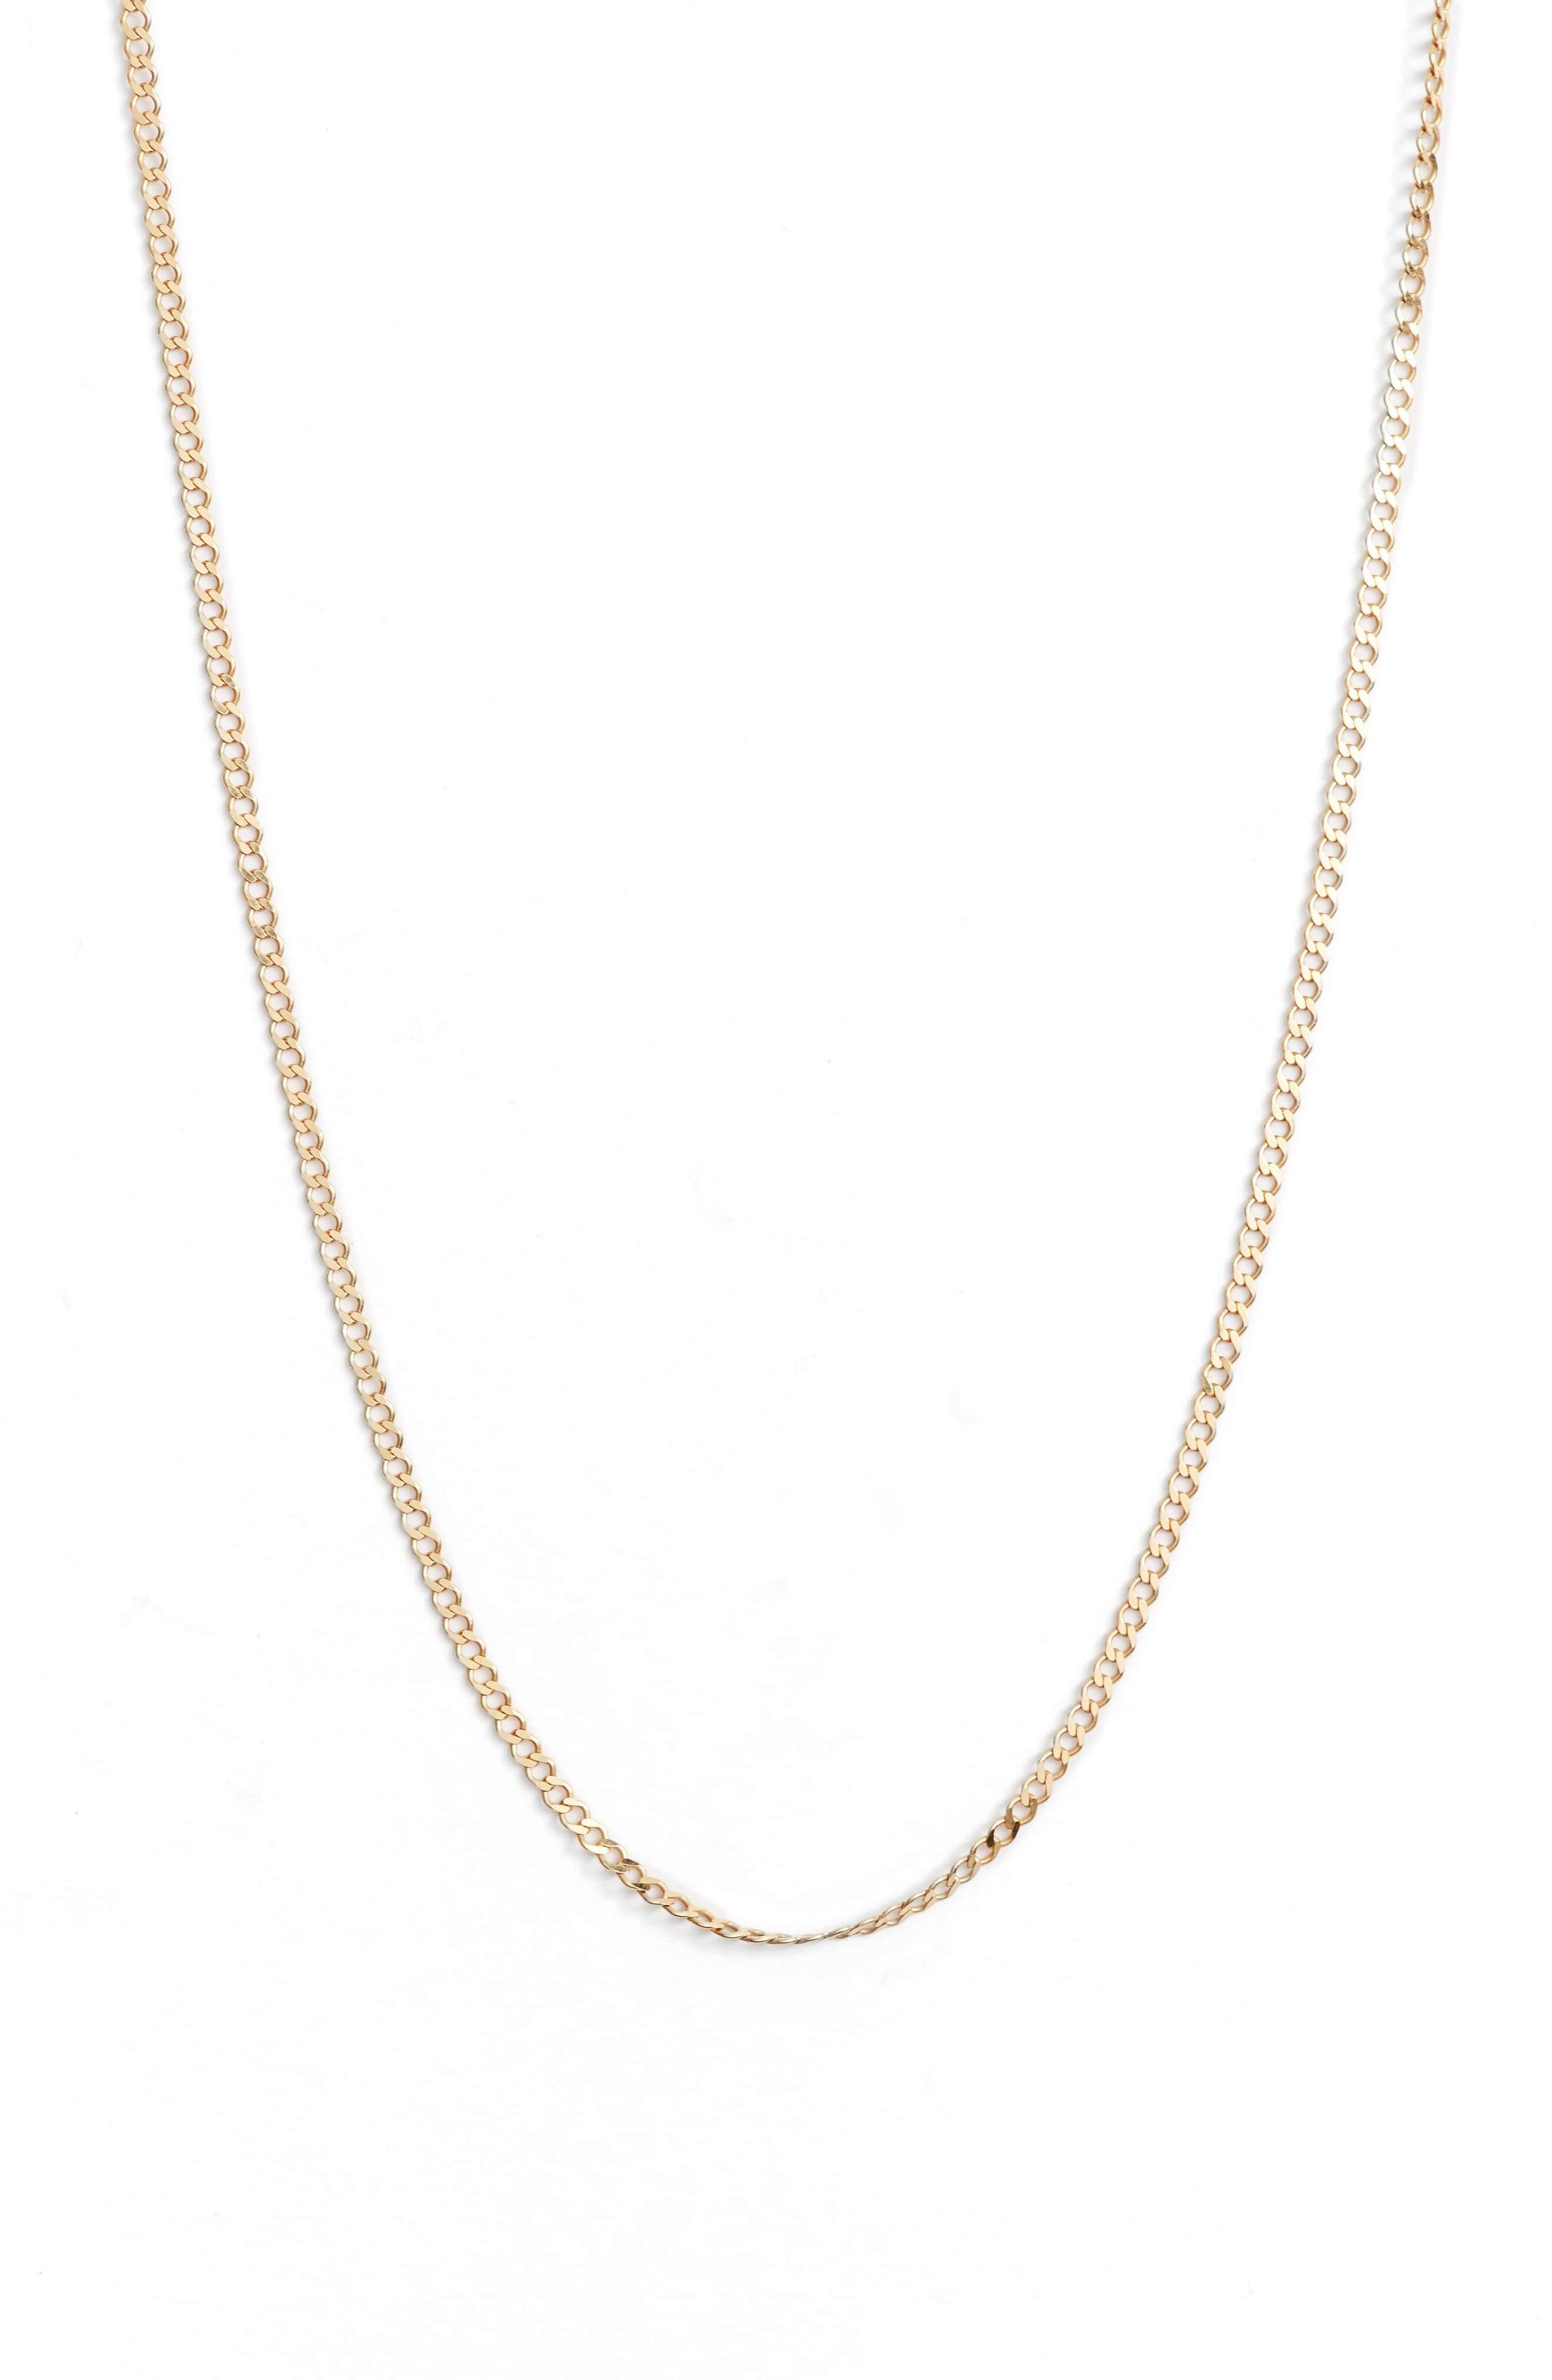 Argento Vivo chainlink necklace